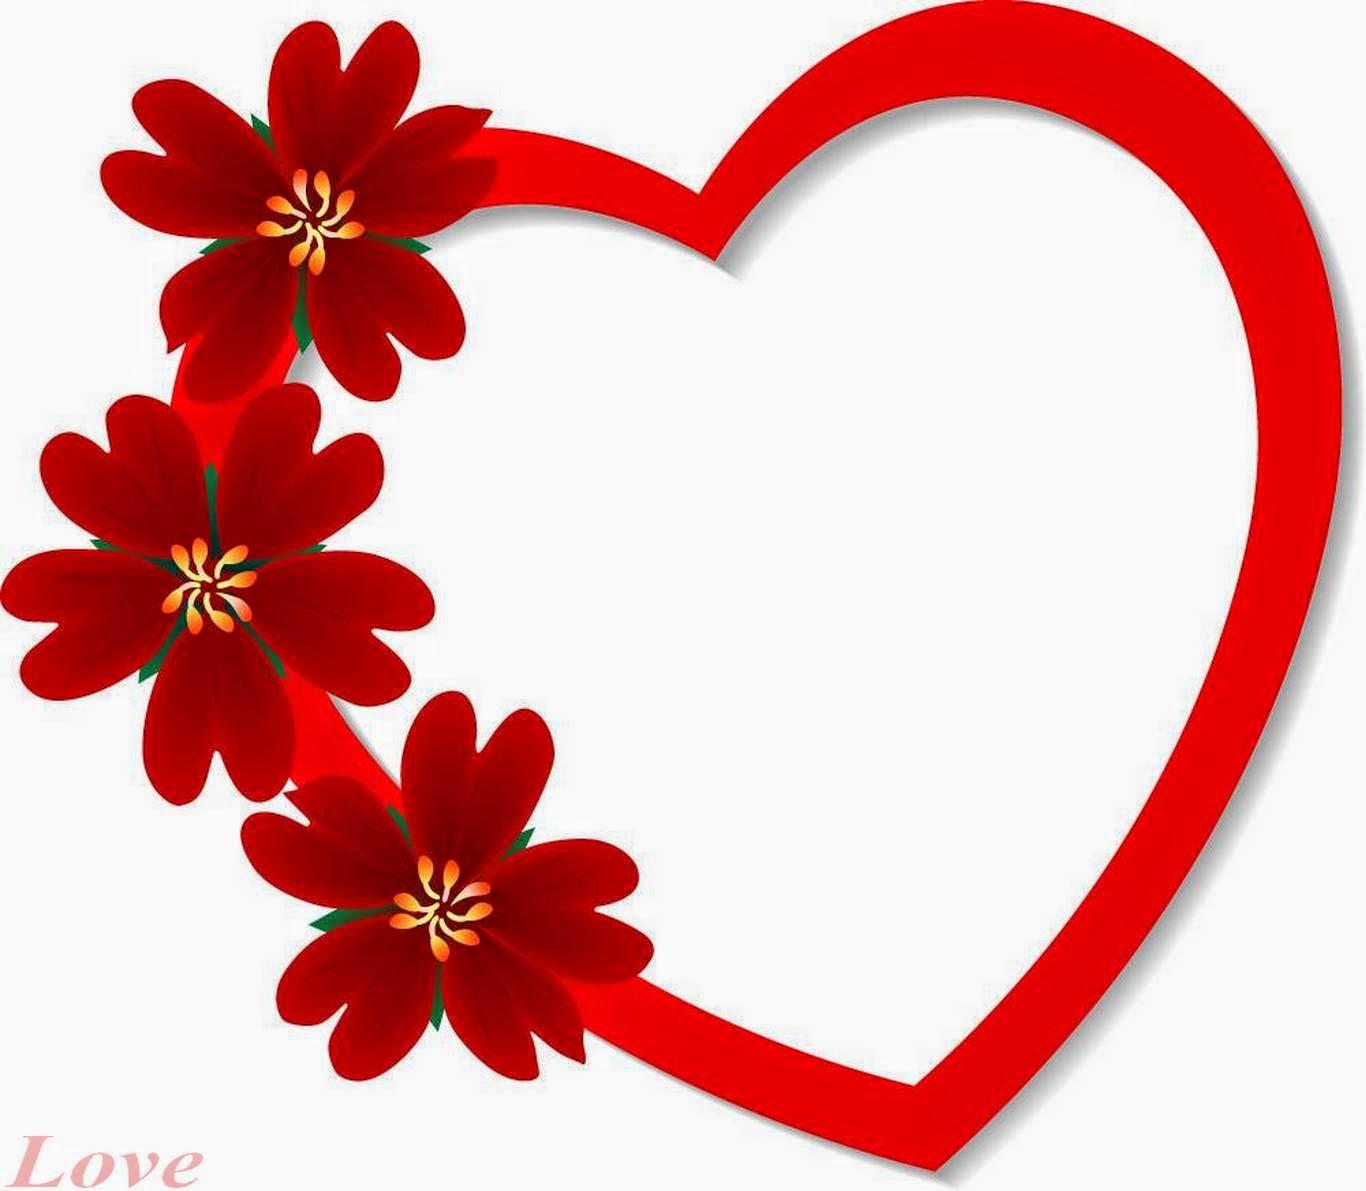 heart floral frame valentine - photo #20